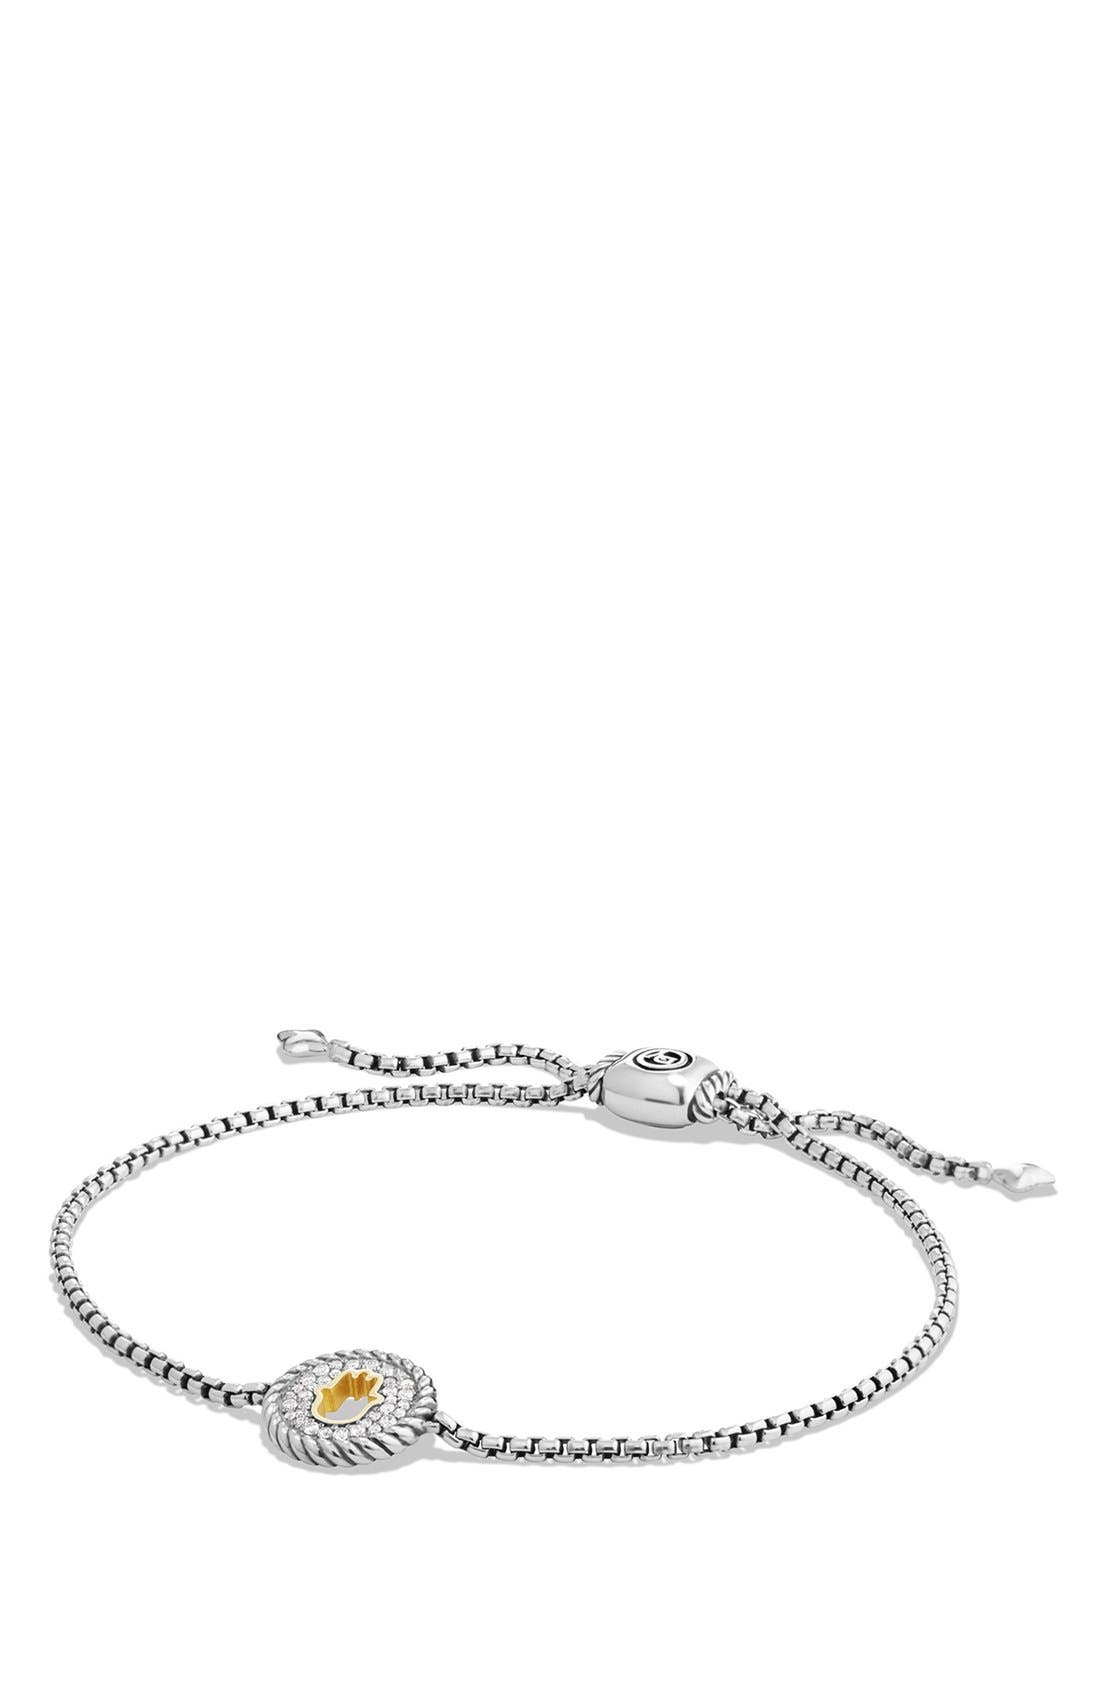 Alternate Image 1 Selected - David Yurman 'Cable Collection' Petite Pavé Hamsa Bracelet